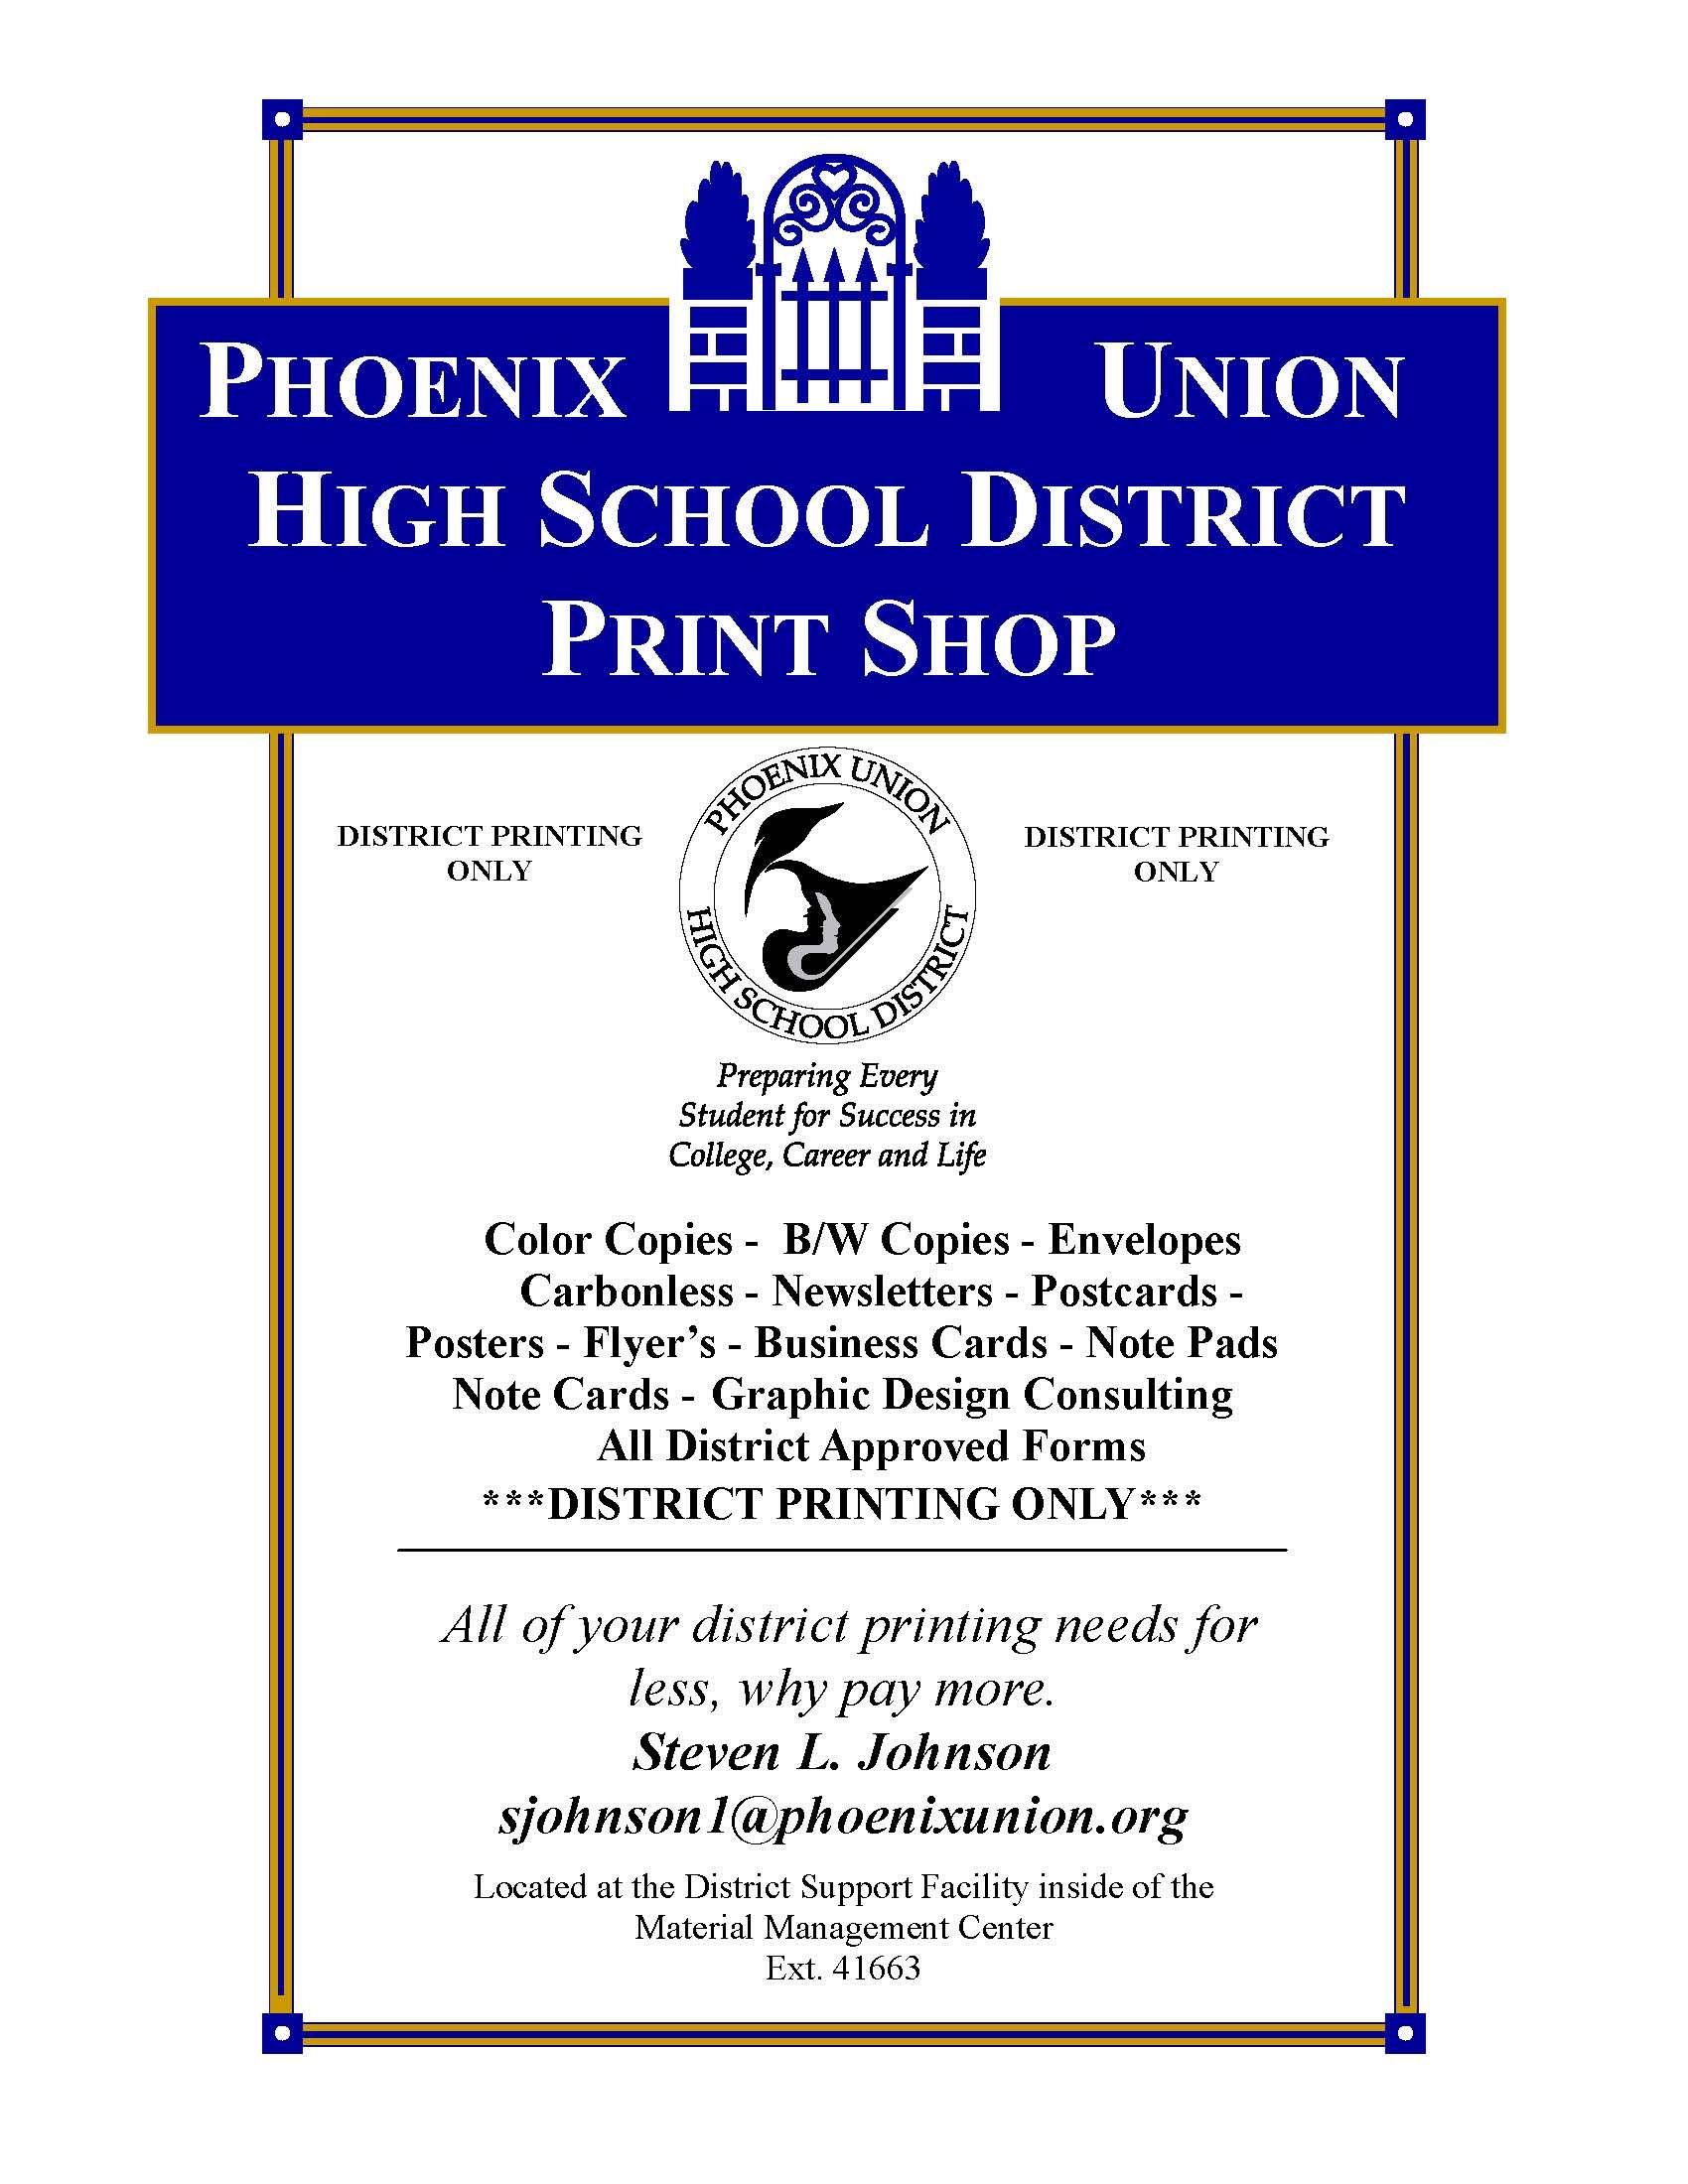 Purchasing Division / Print Shop